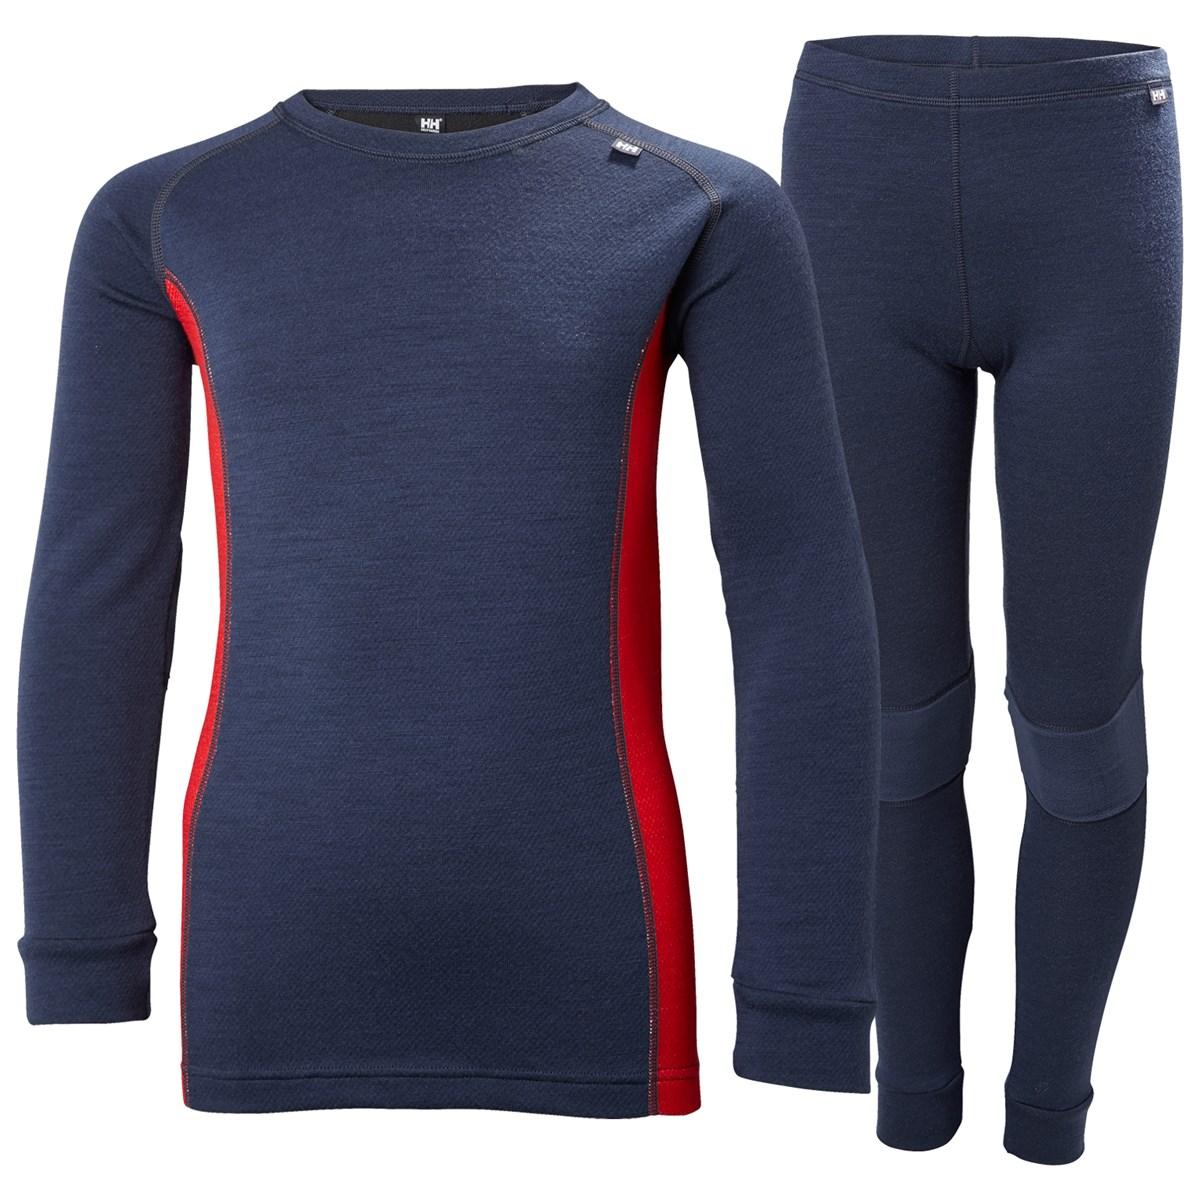 0a41f35ca1 Helly Hansen Kids Lifa Merino Thermal Vest and Leggings Set Blue £60.00